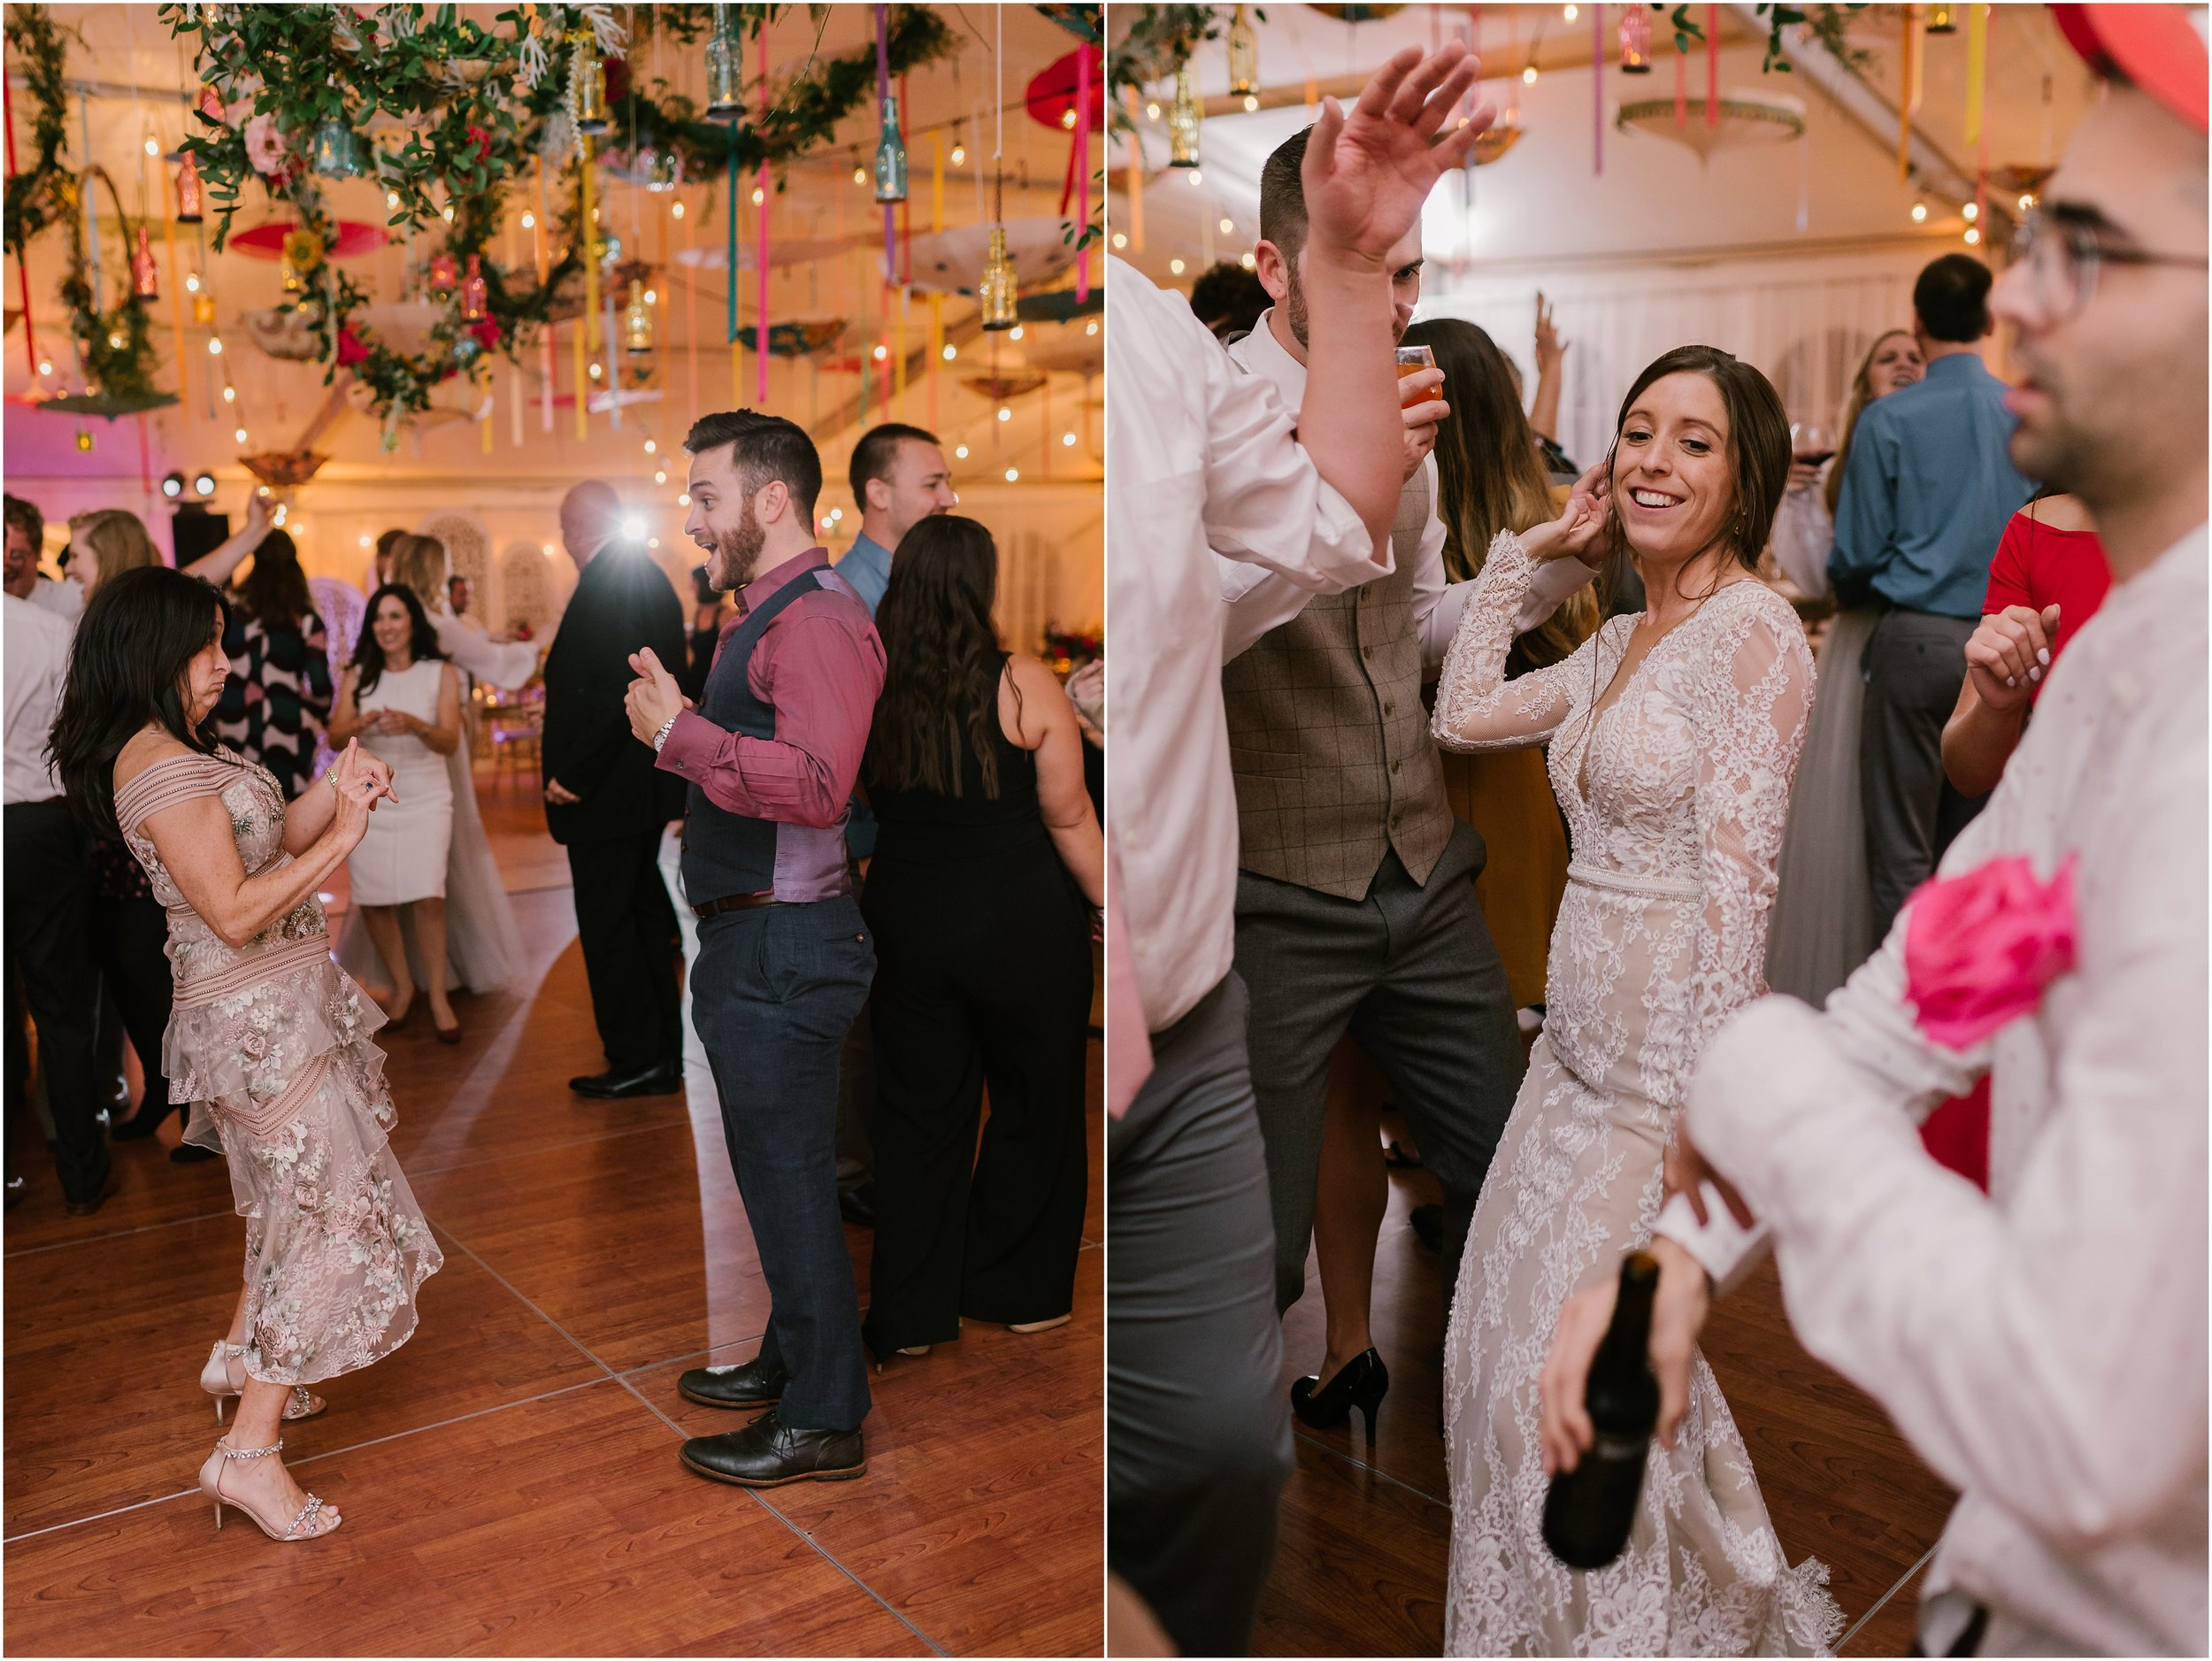 Rebecca_Shehorn_Photography_Indianapolis_Wedding_Photographer_9295.jpg